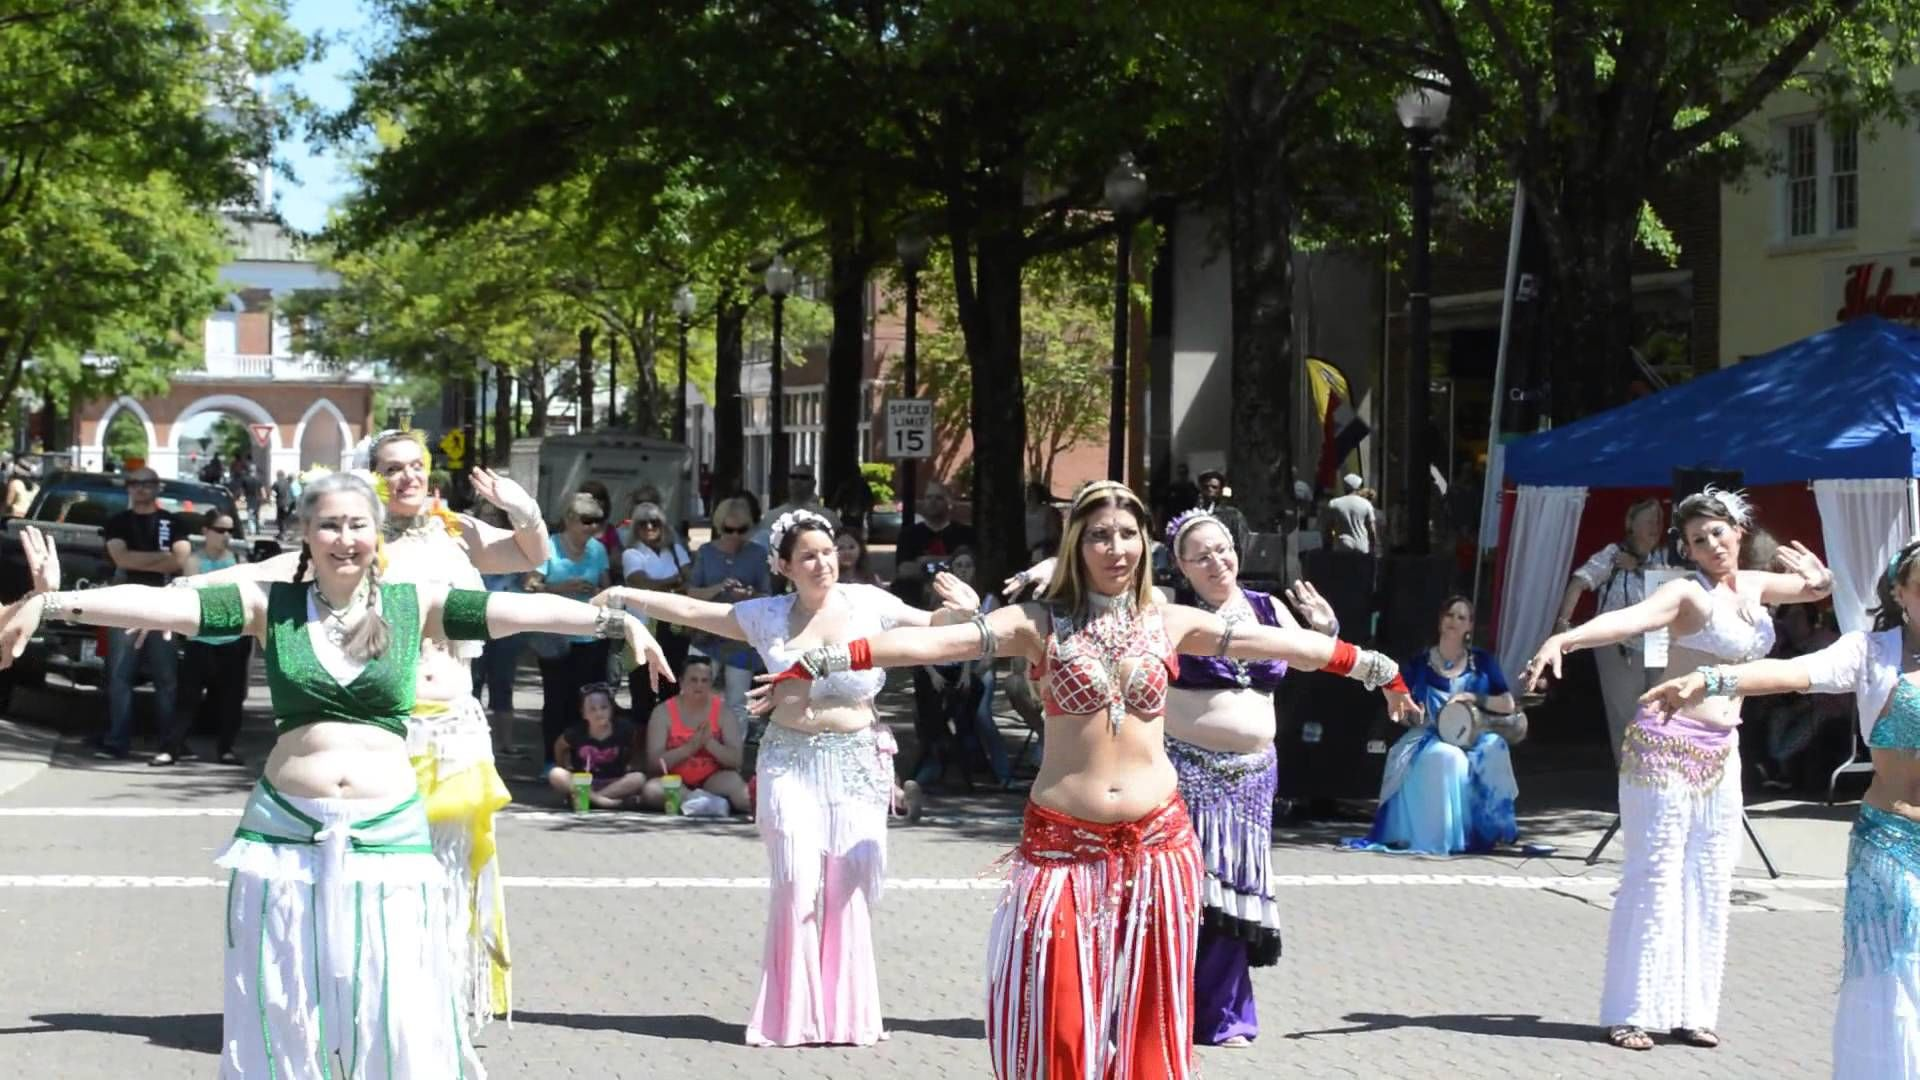 2014 Fayetteville Dogwood Festival Belly Dancing Street Performance Street Performance Belly Dance Fayetteville